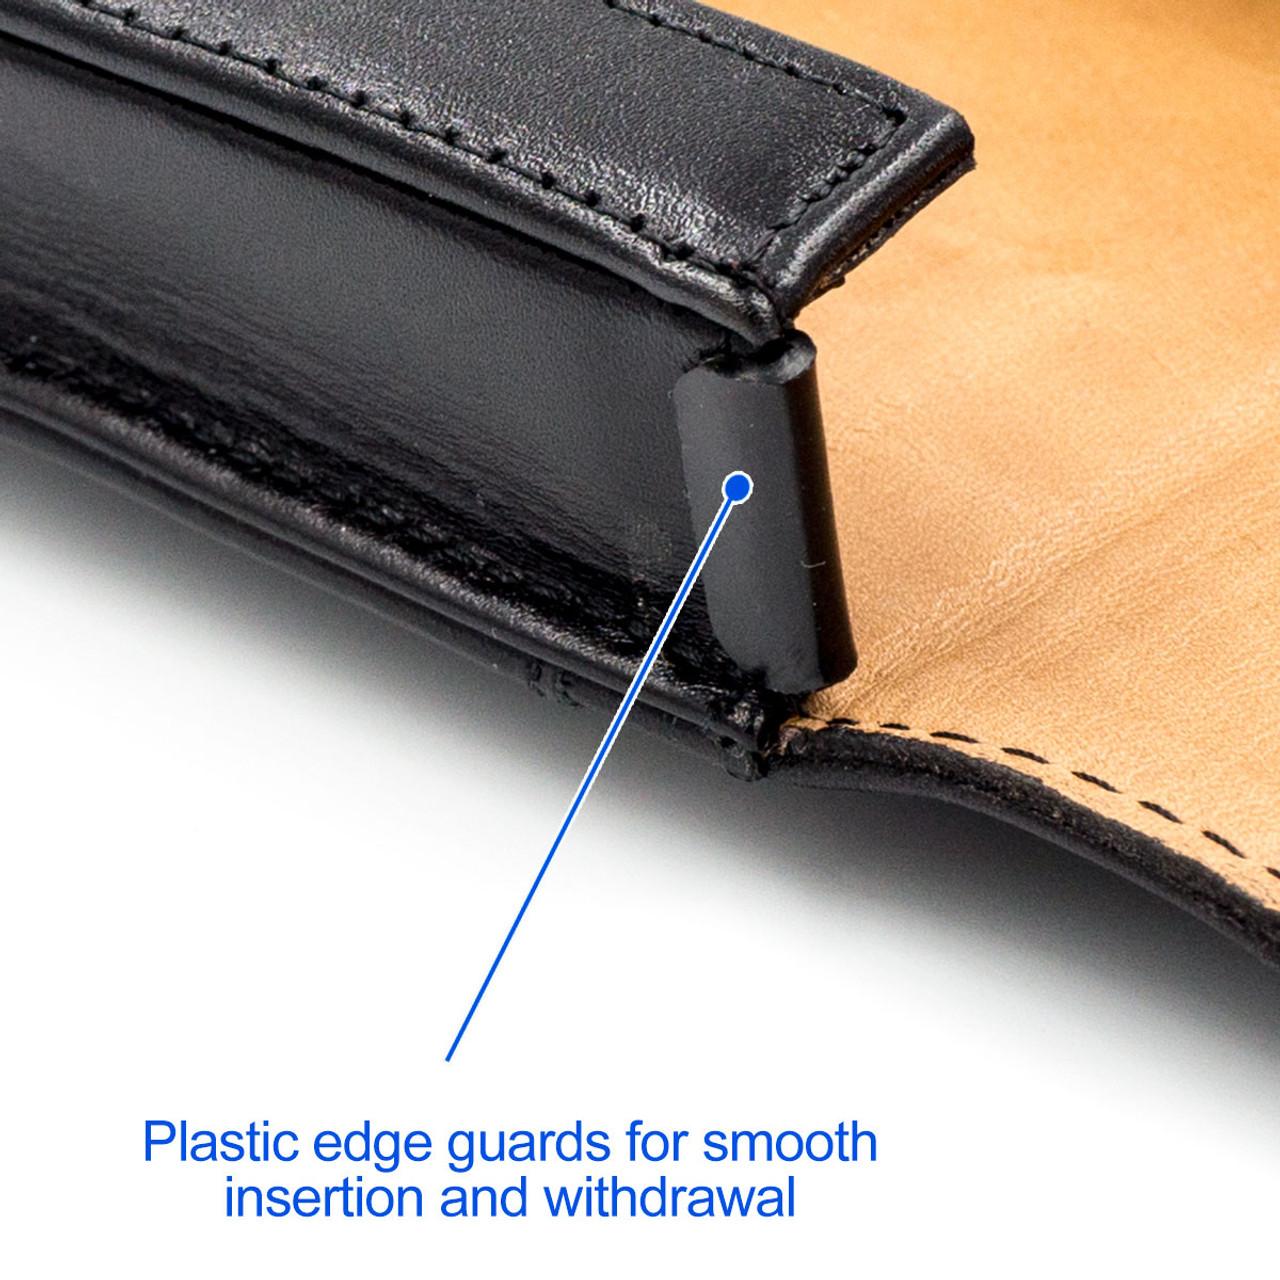 HK VP40 Concealed Carry Holster (Belt Loop)